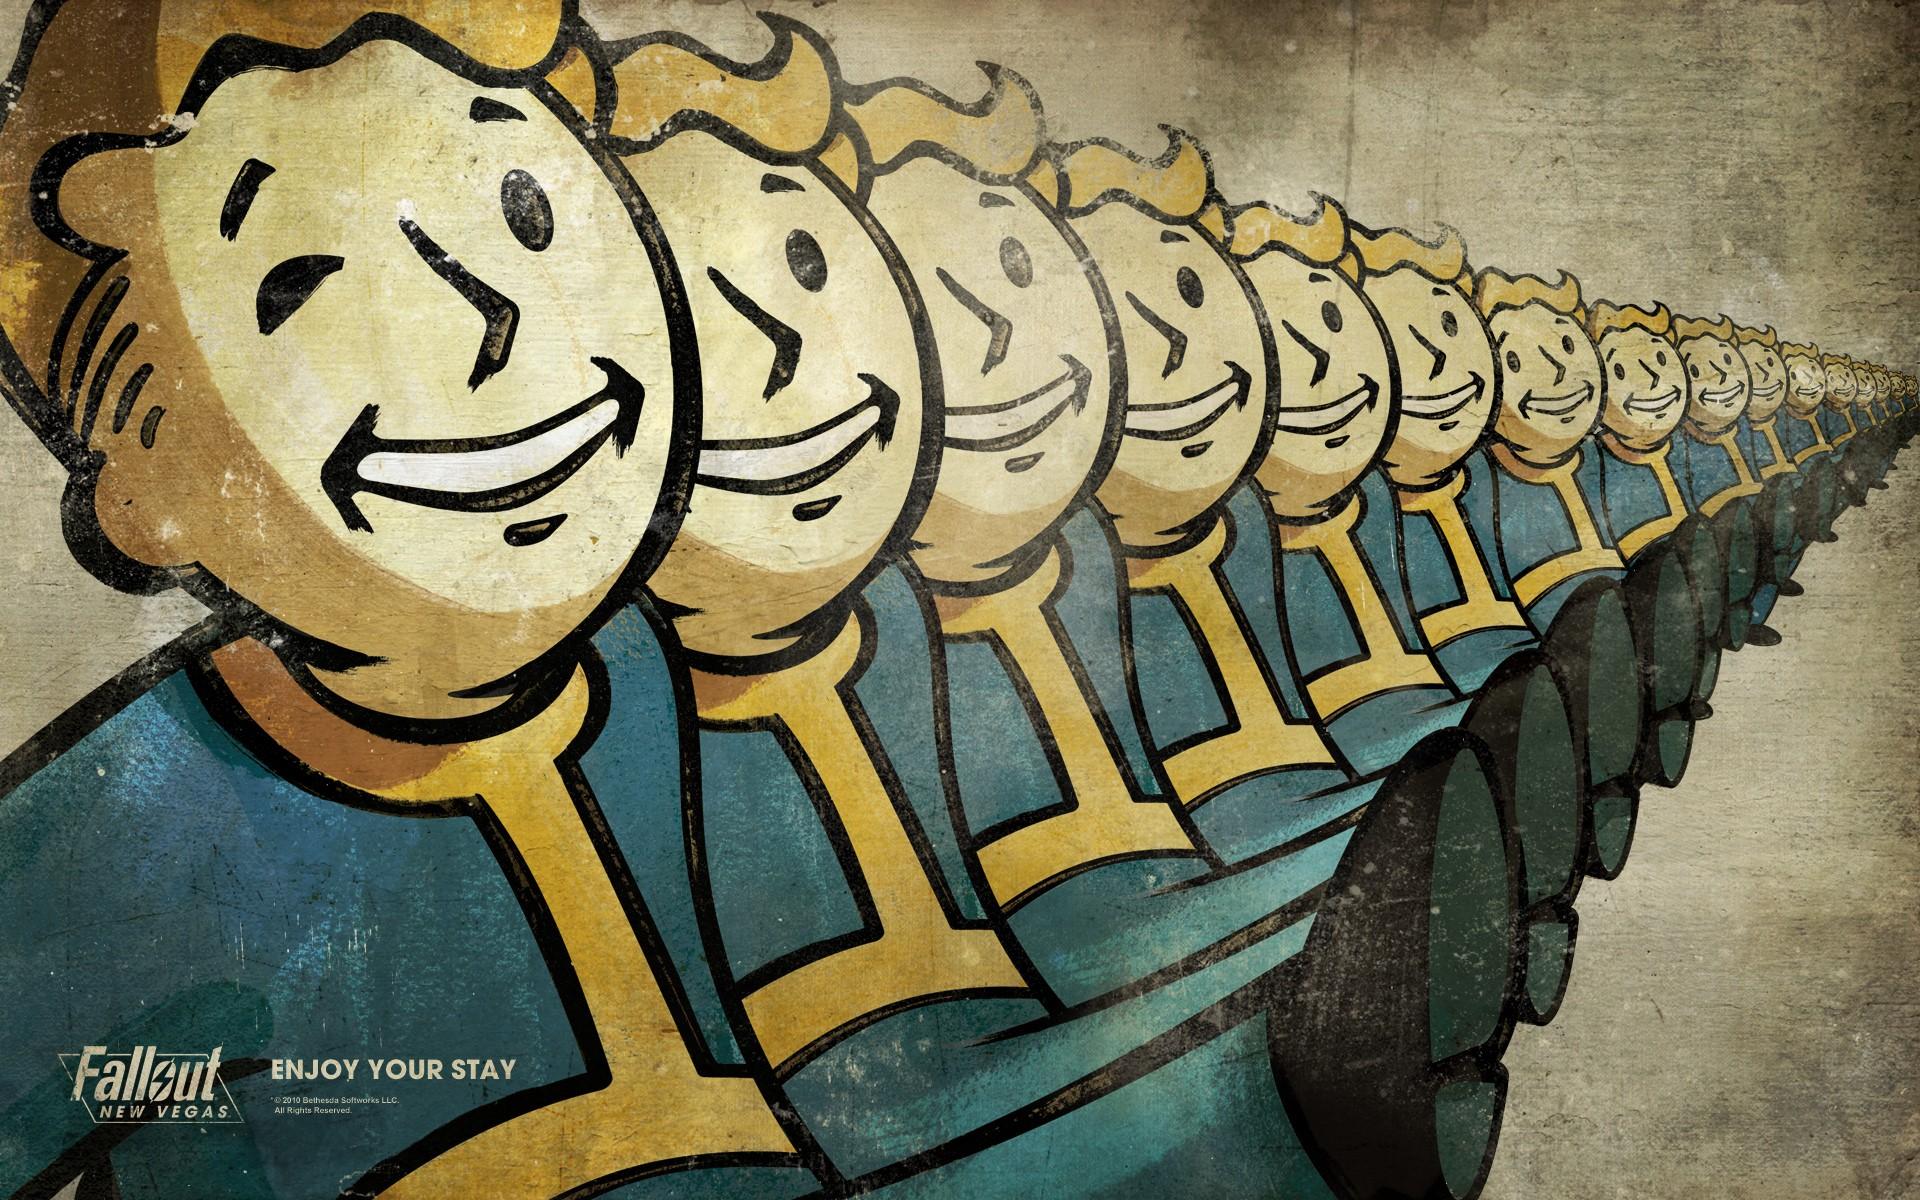 General 1920x1200 Fallout Vault Boy drains Fallout: New Vegas